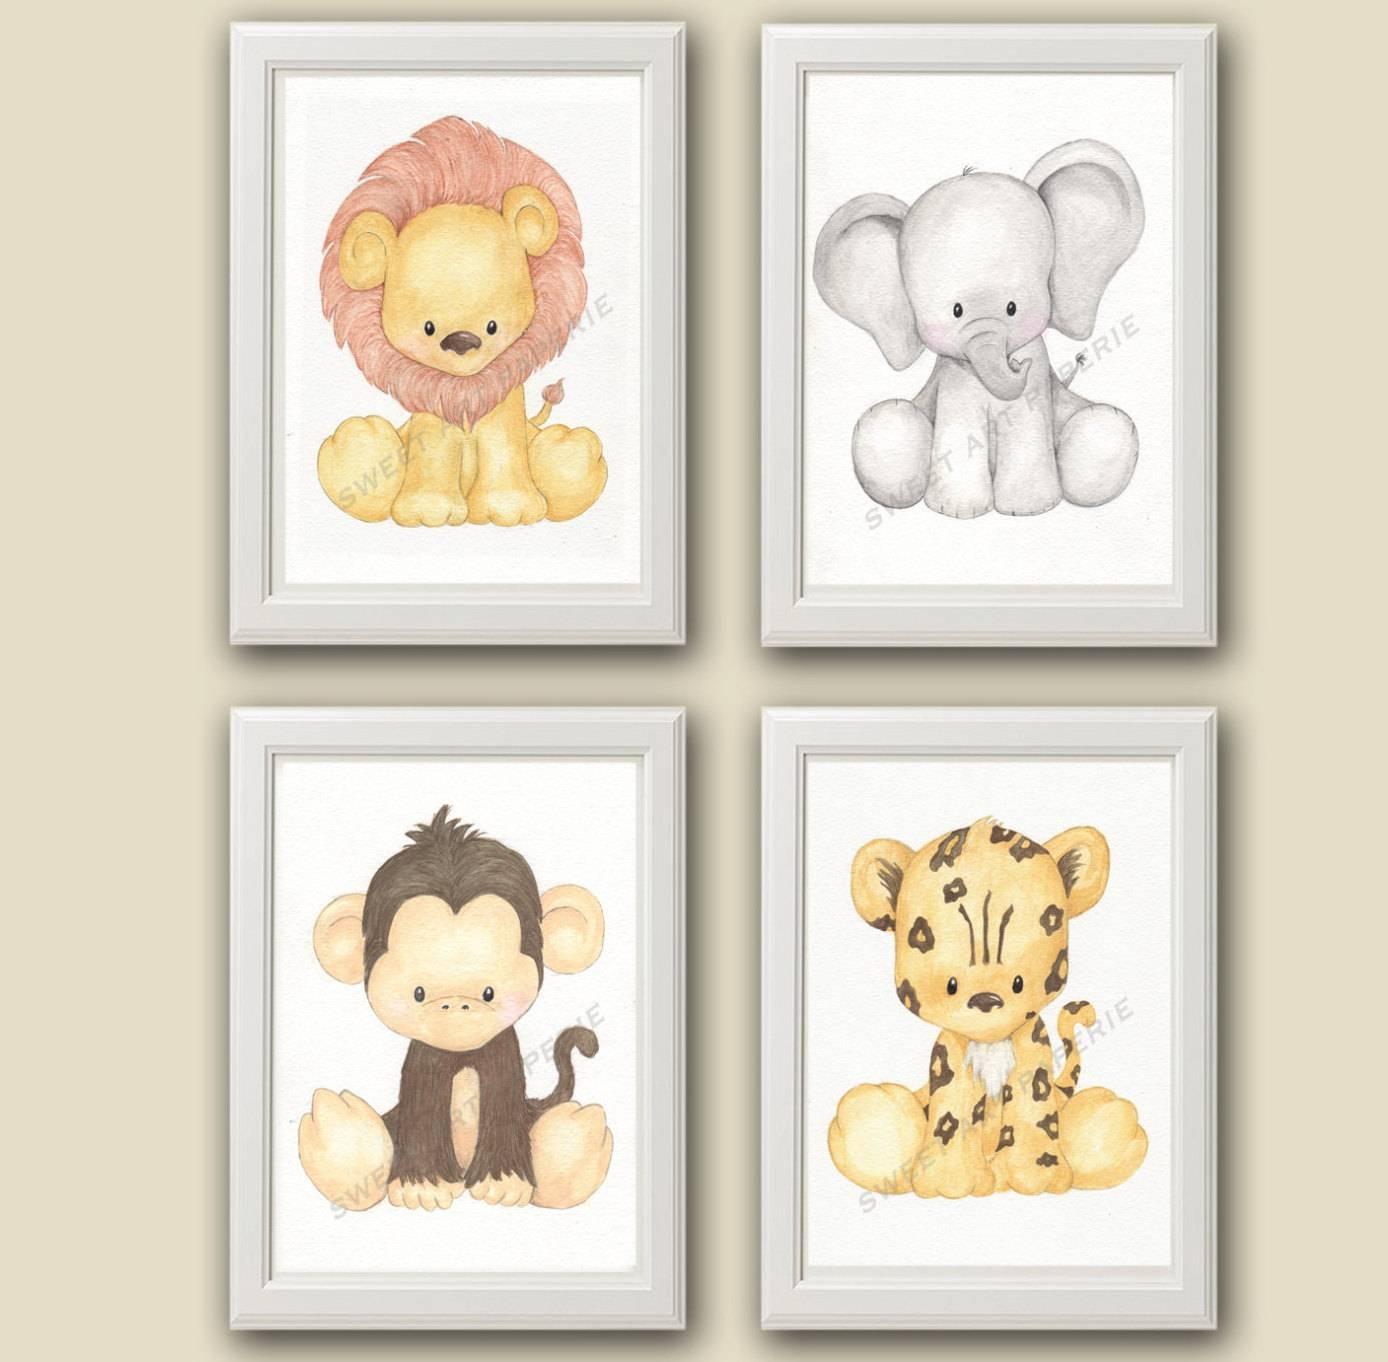 Zoo Nursery Art Nursery Decor Set Of 4 Prints Zoo With Most Up To Date Animal Wall ArtFor Nursery (Gallery 5 of 20)